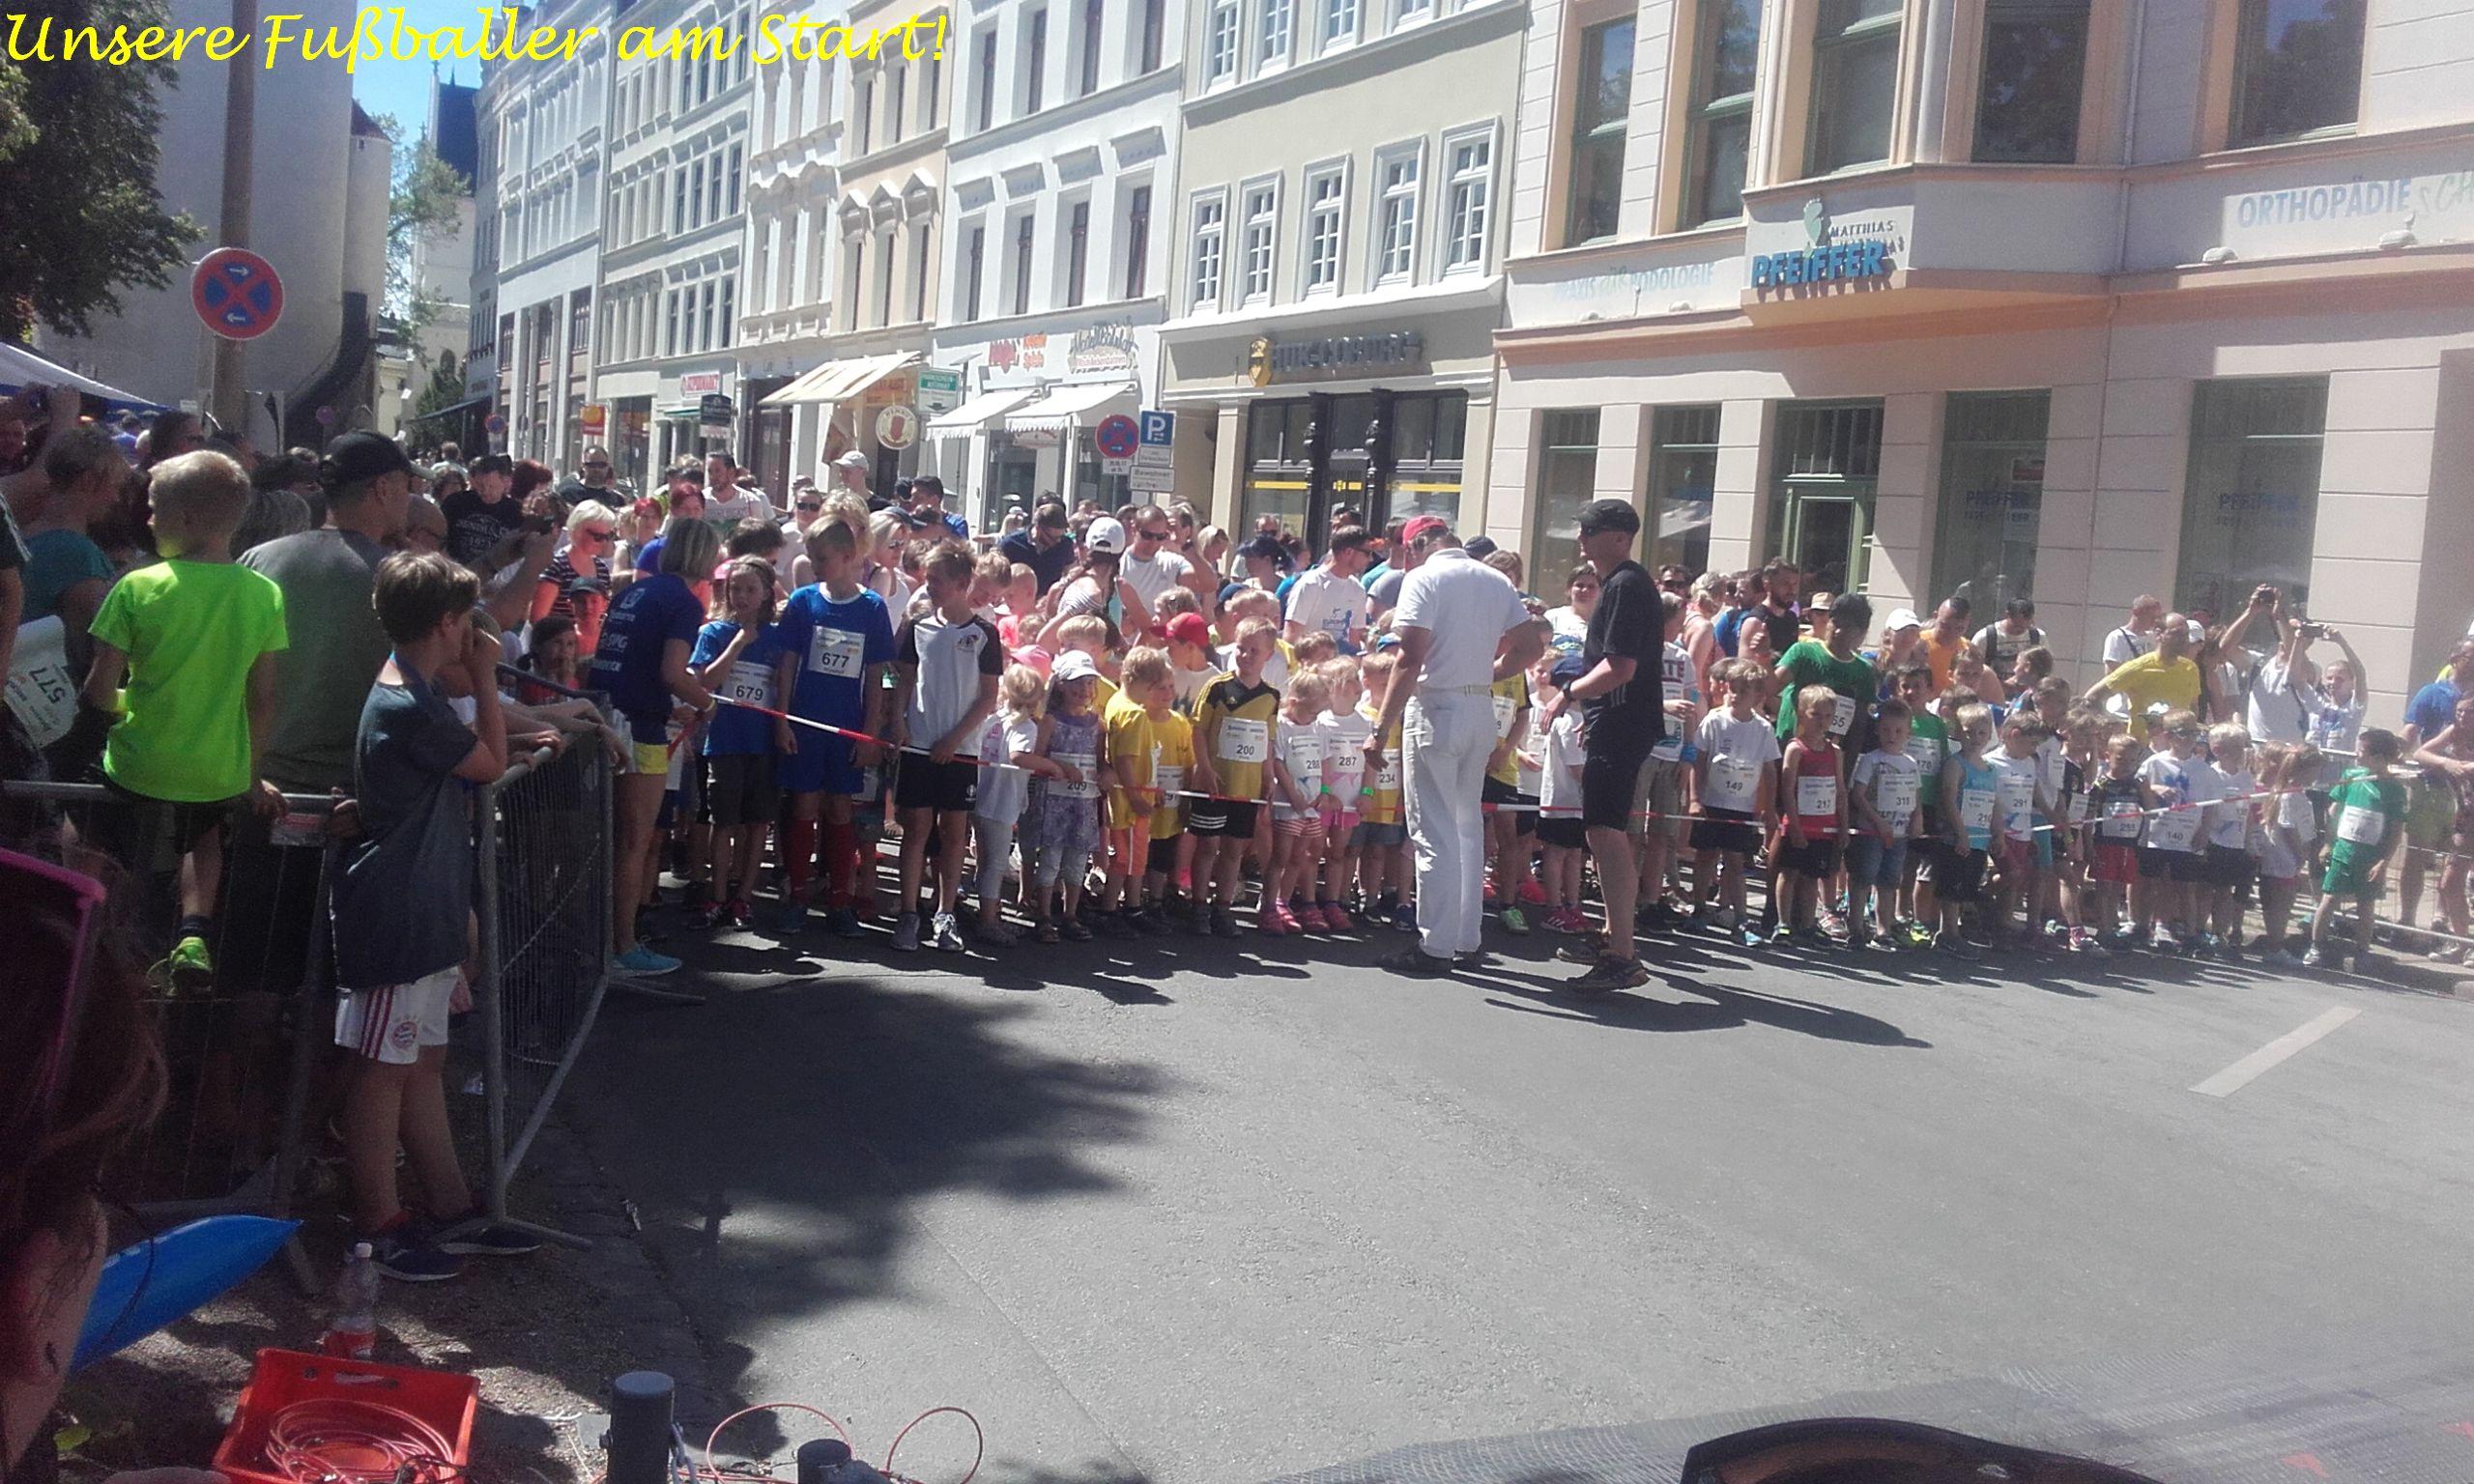 02_europamarathon_bambinilauf_quer_2017-05-28